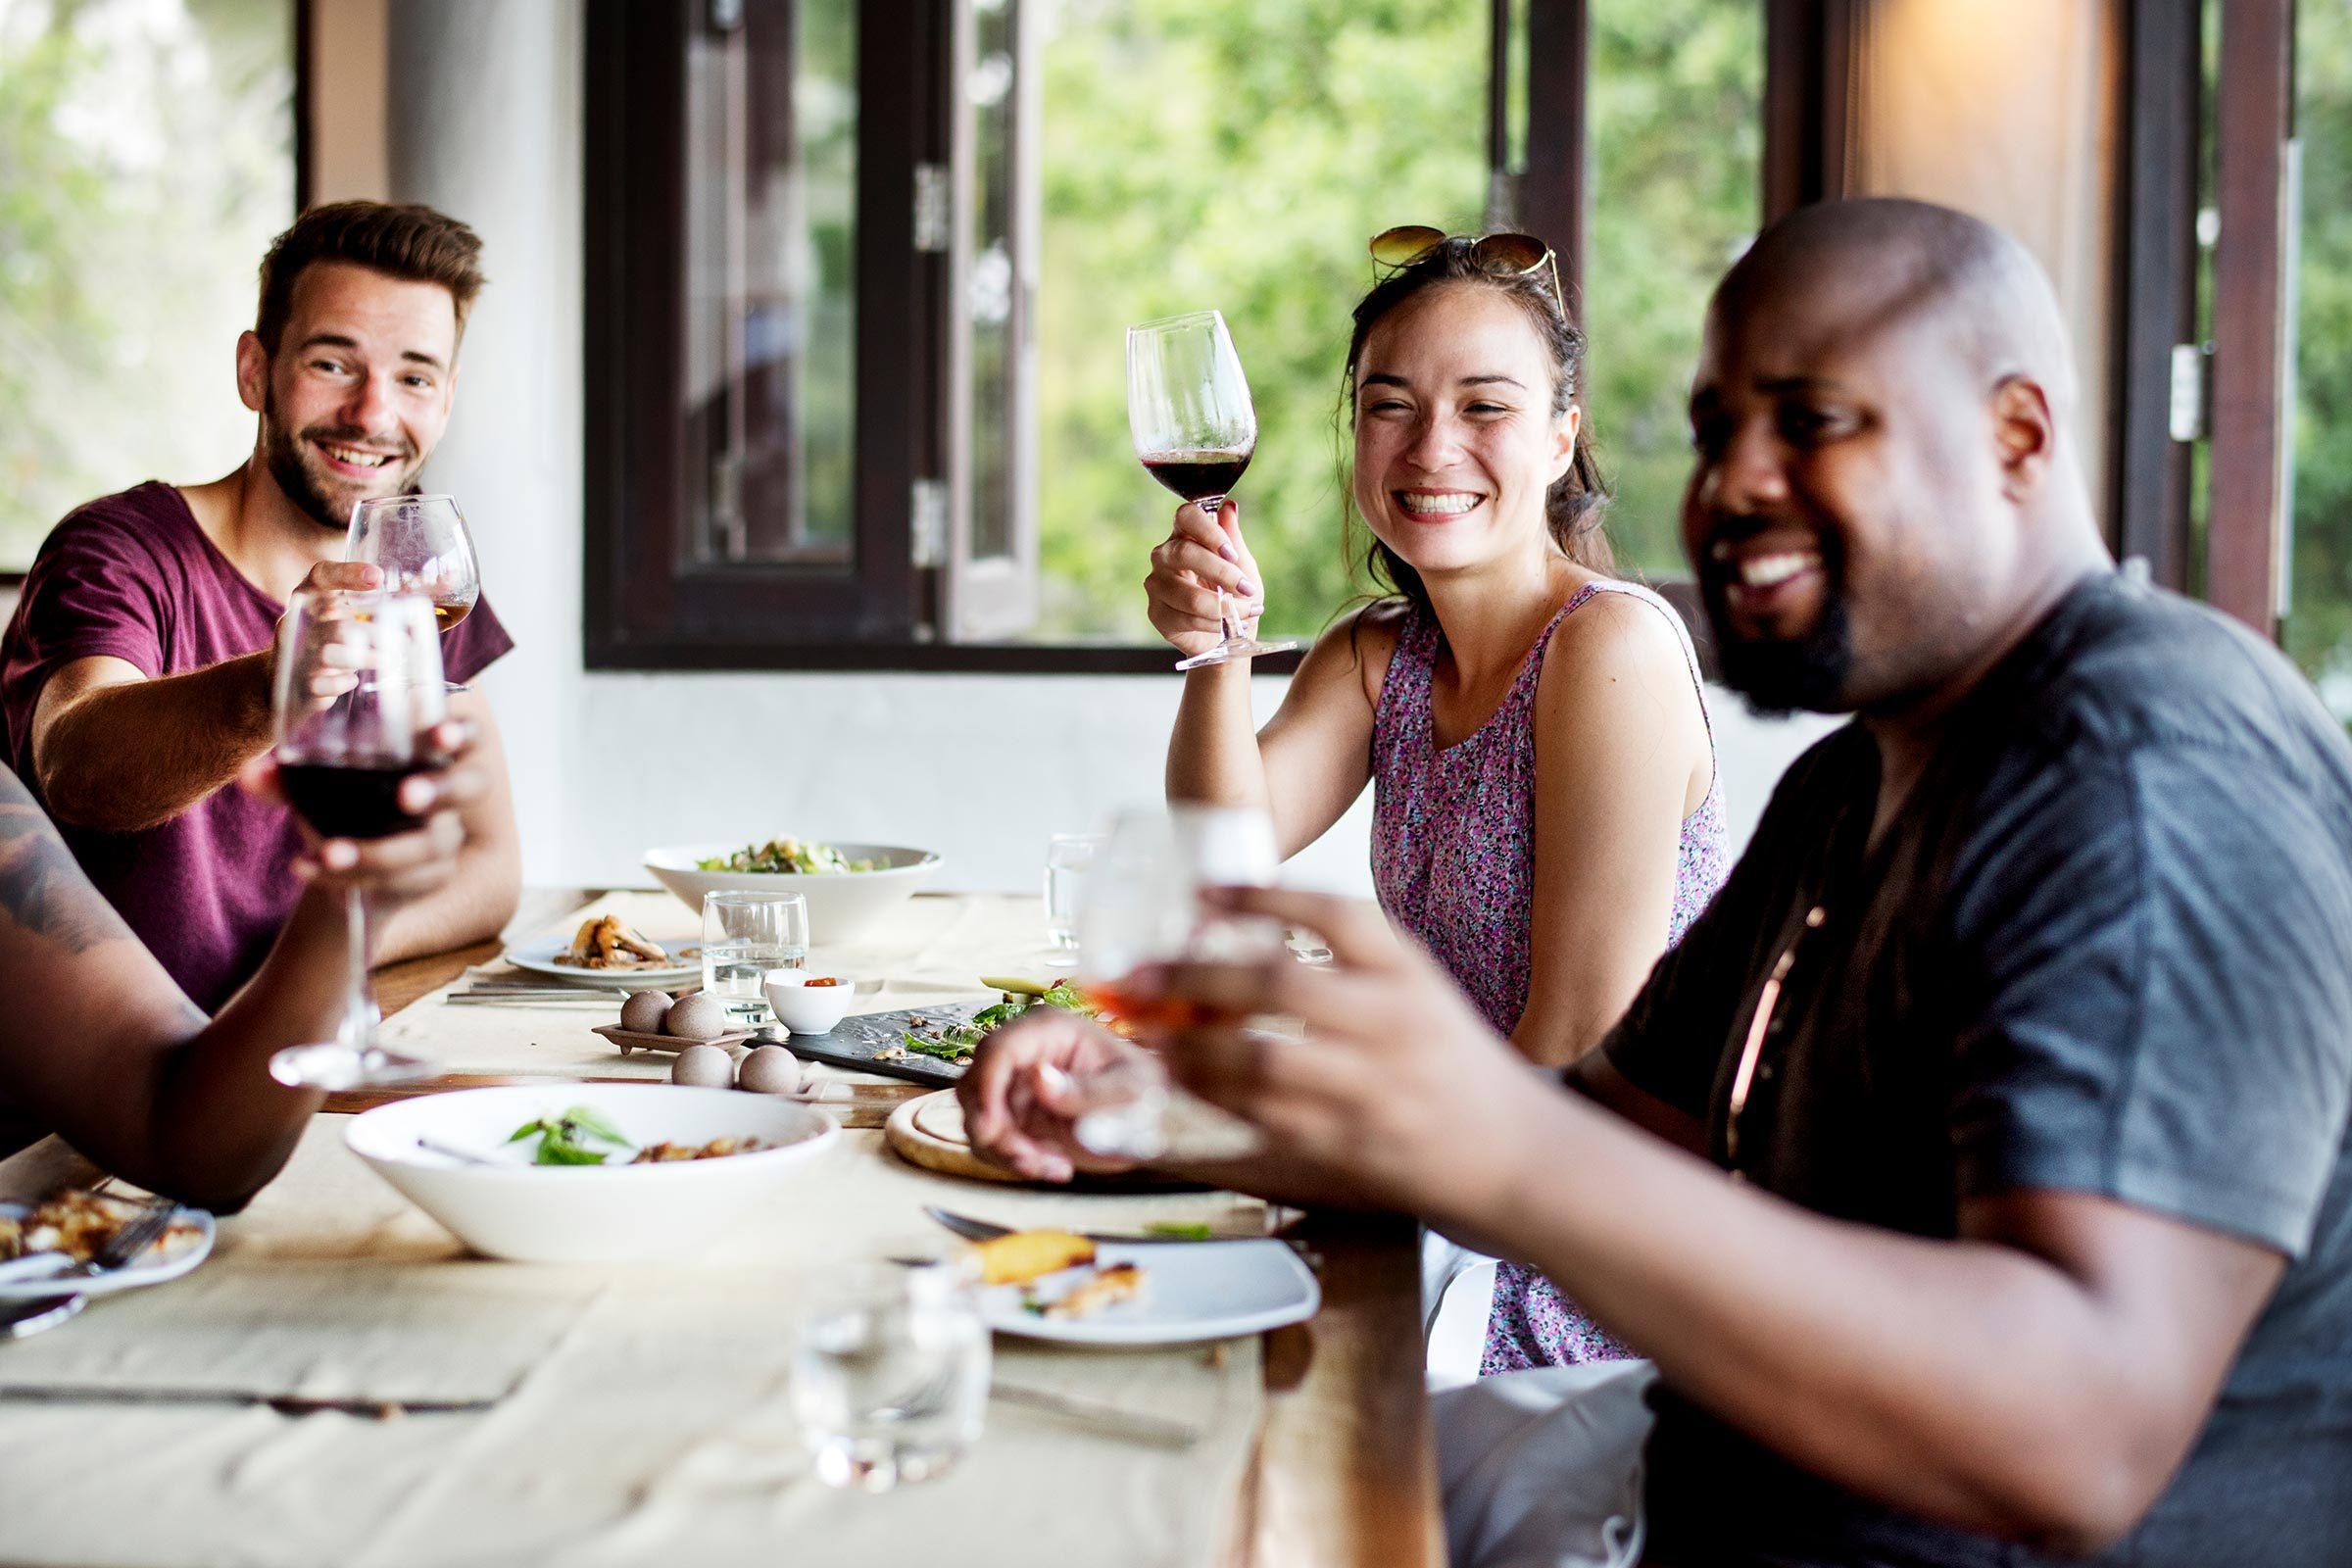 happy hour dinner friends